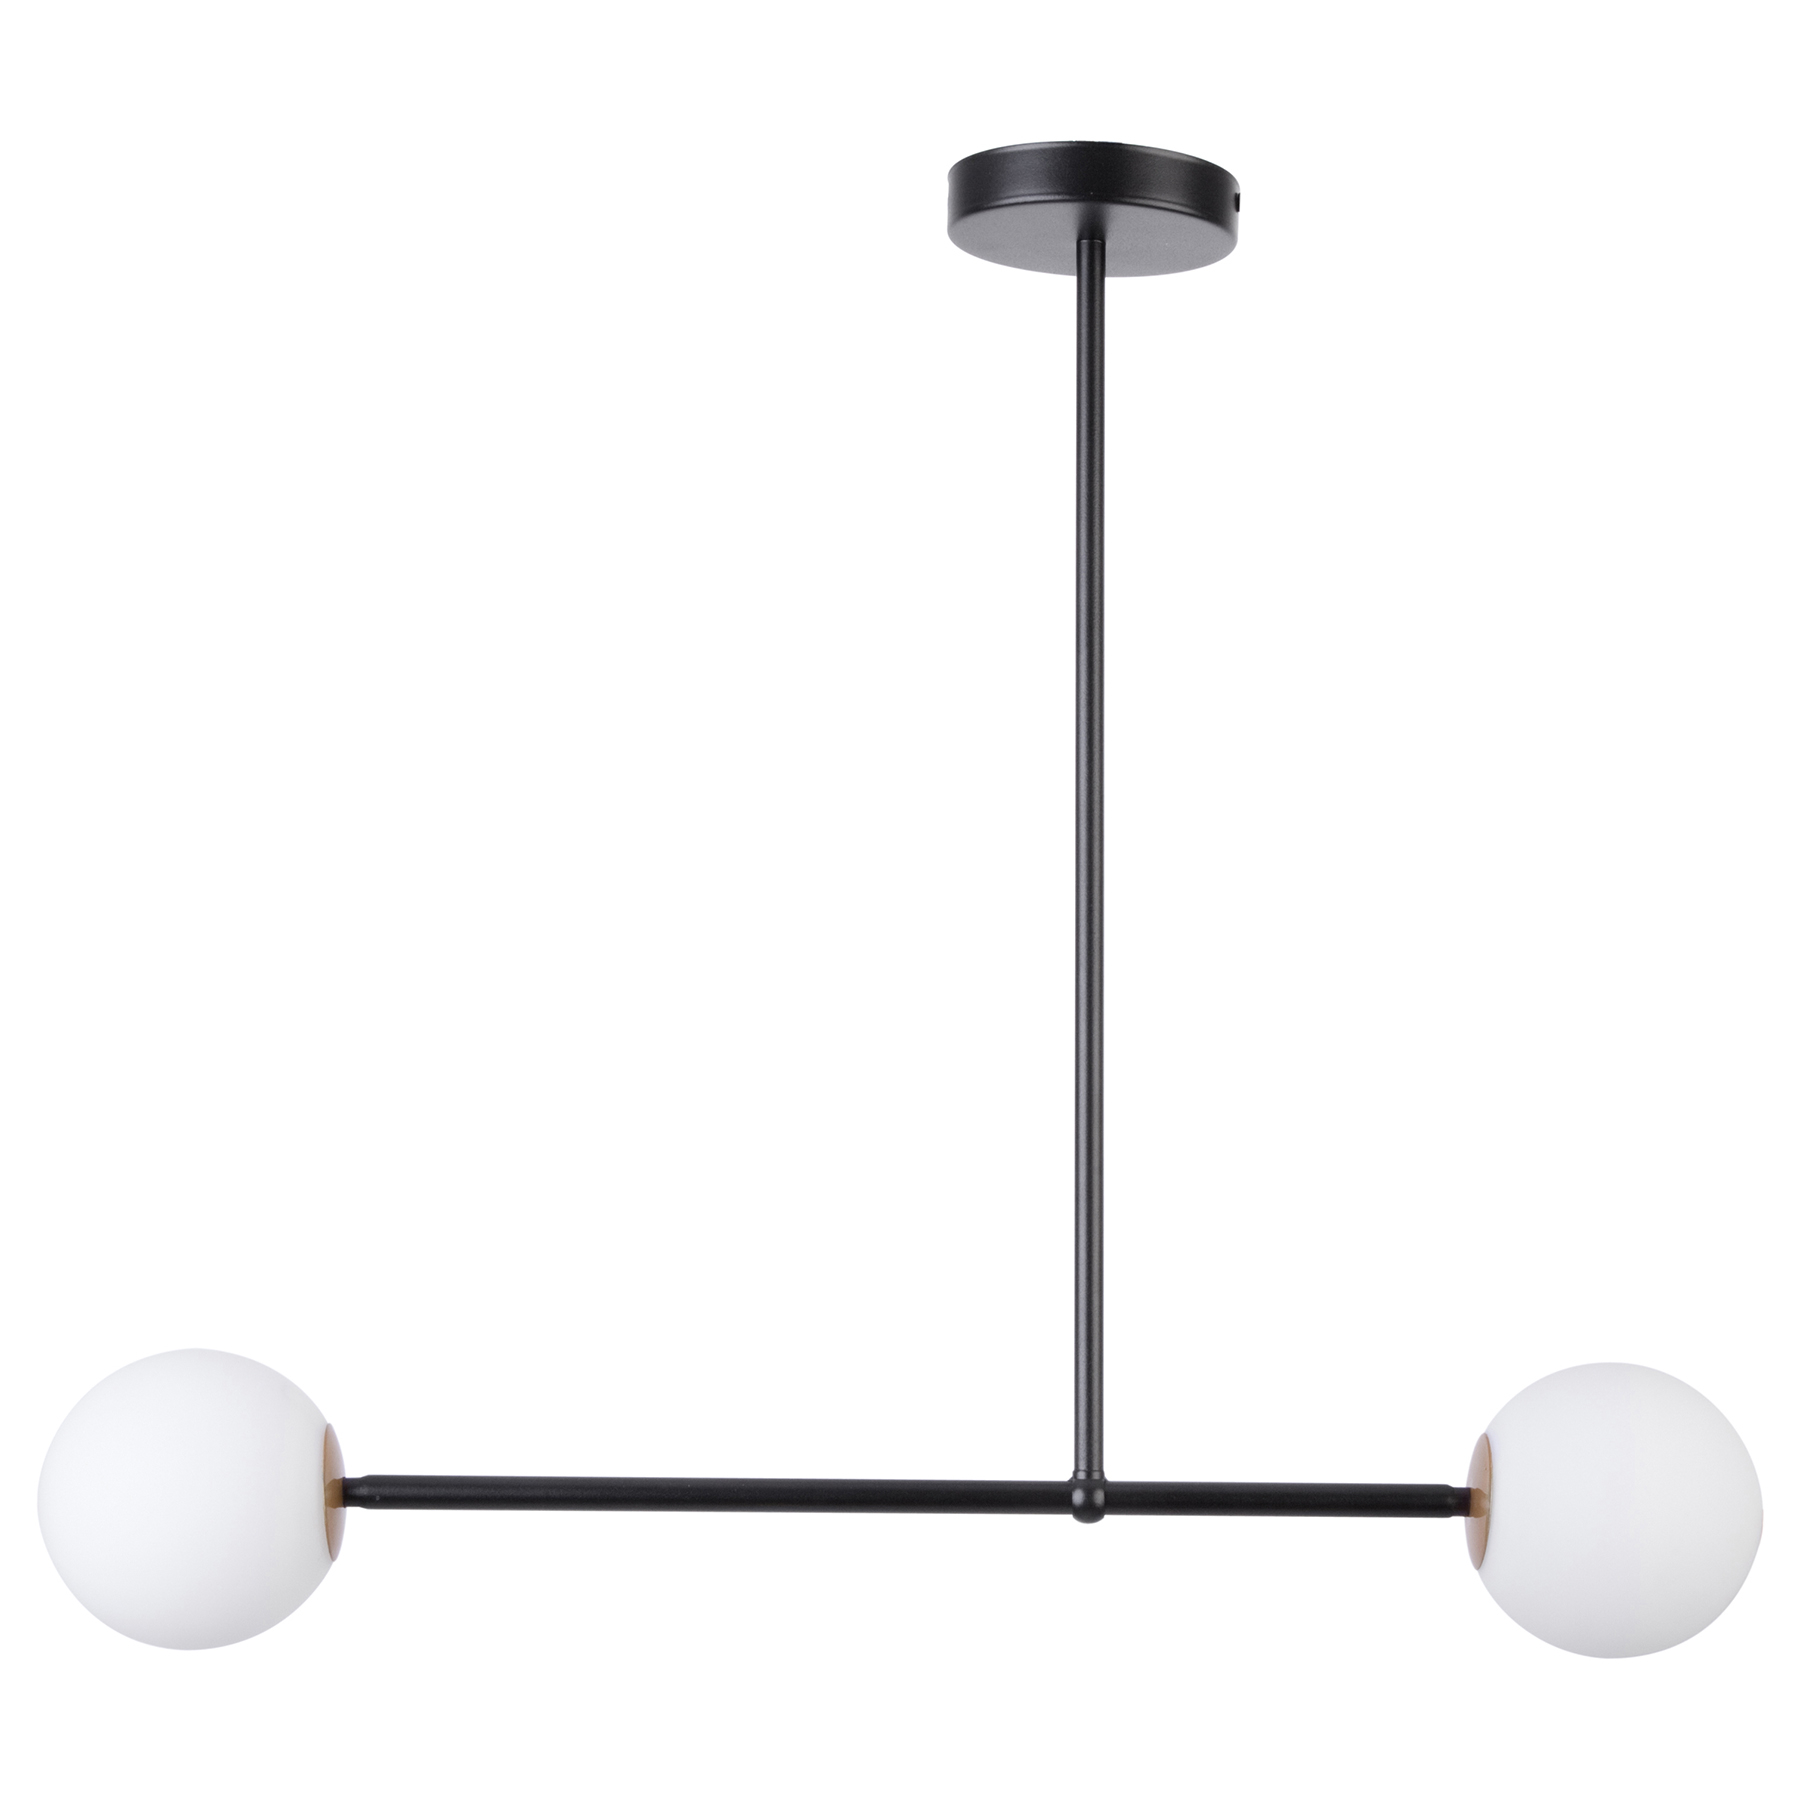 Hanglamp Gama 2, 2-lamps, zwart